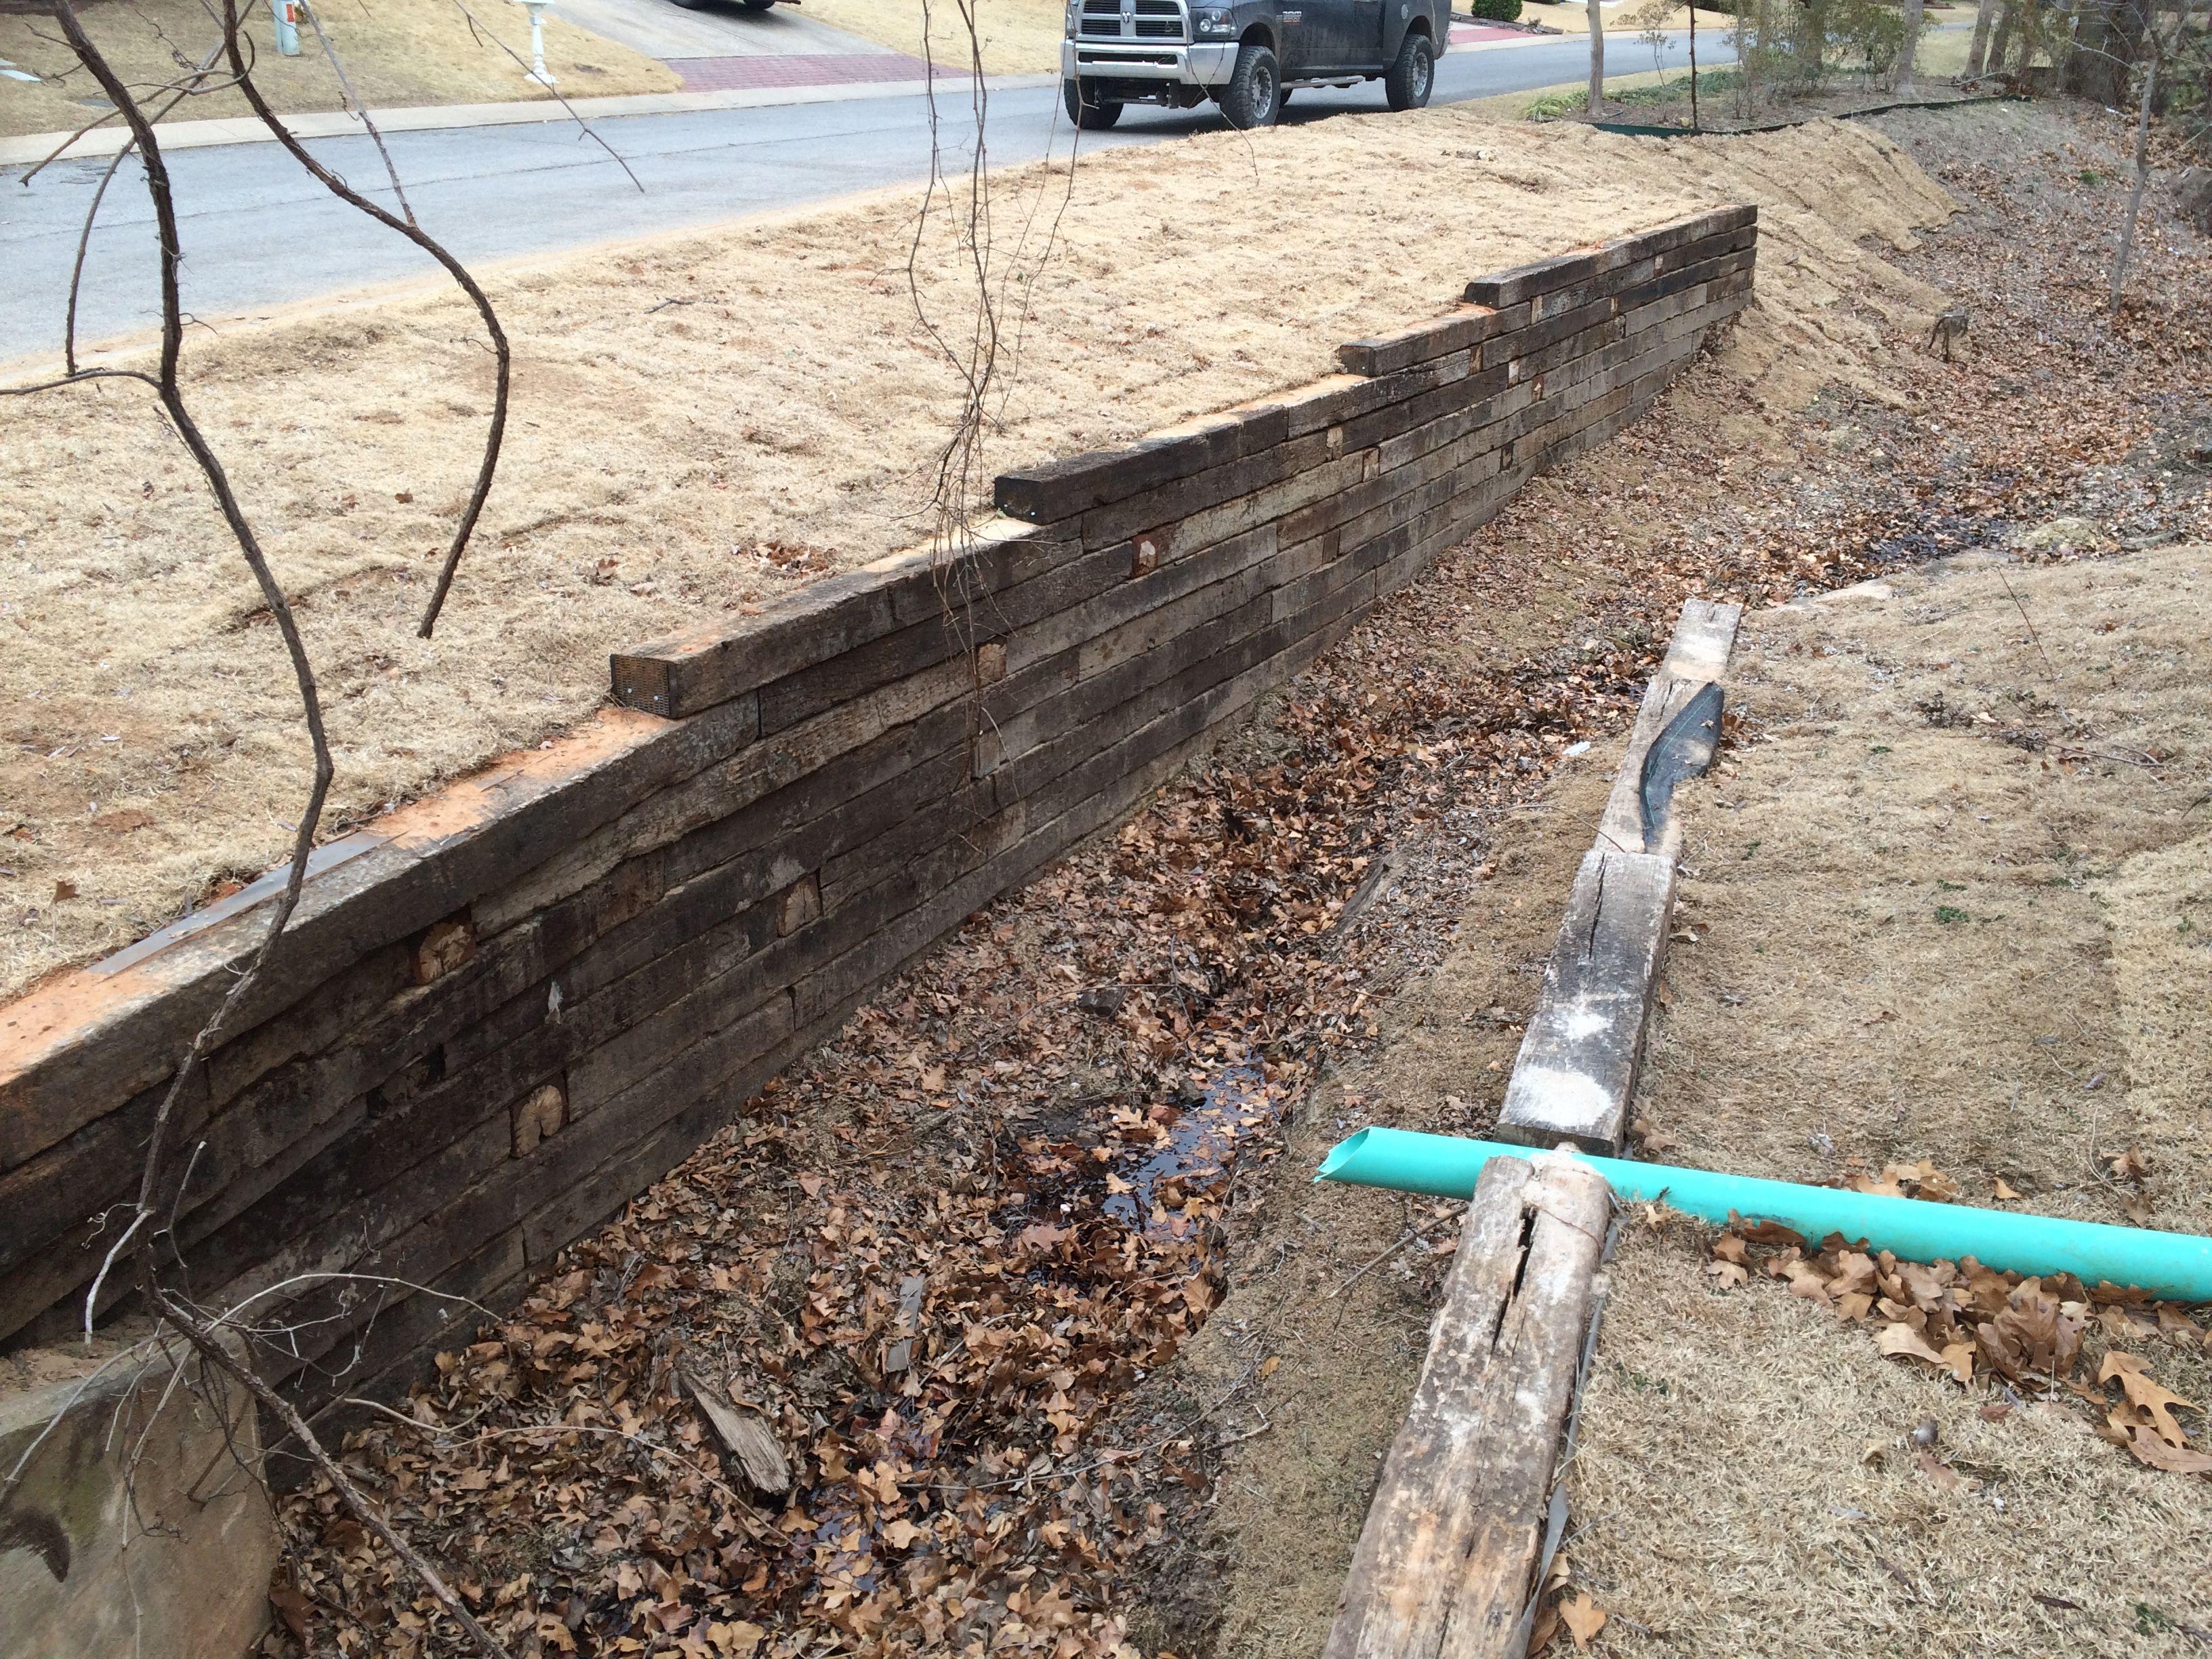 Railroad Tie Retaining Wall Installation In Tulsa Railroad Tie Retaining Walls Hardscaping Landscaping Railroad Tie Retaining Wall Hardscape Landscape Walls